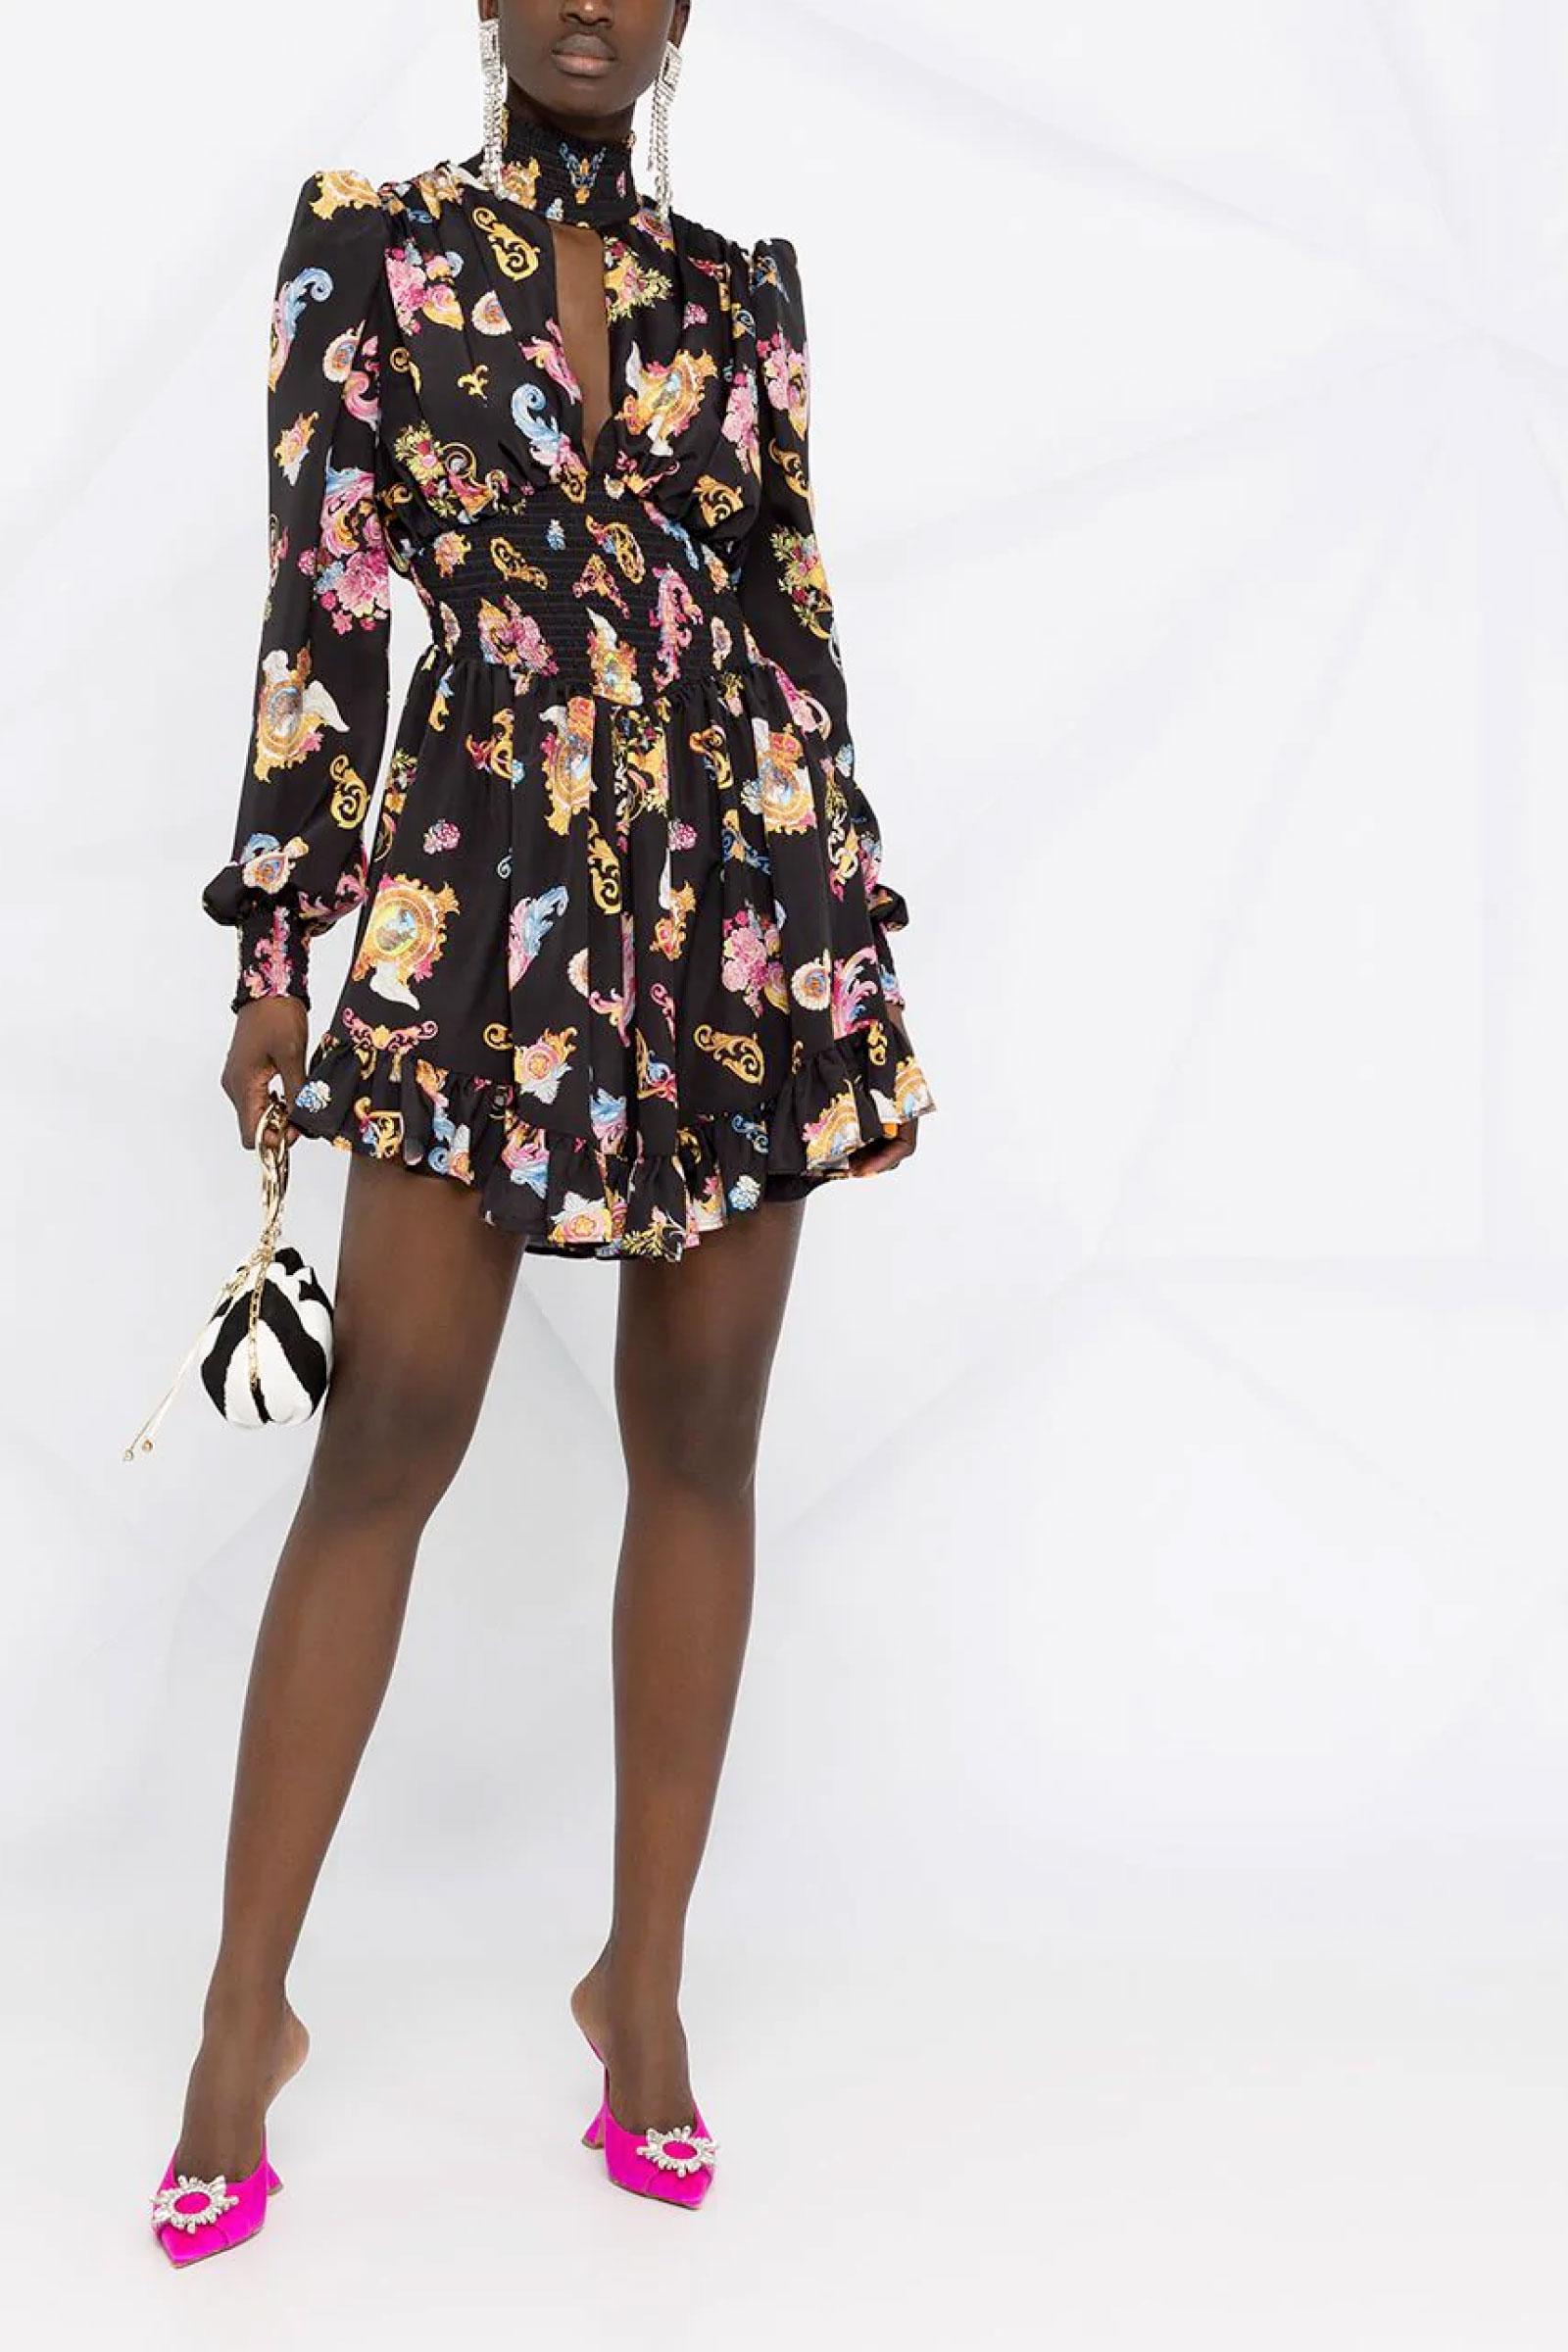 VERSACE JEANS COUTURE Vestito Donna VERSACE JEANS COUTURE | Vestito | D2HWA410S0996899